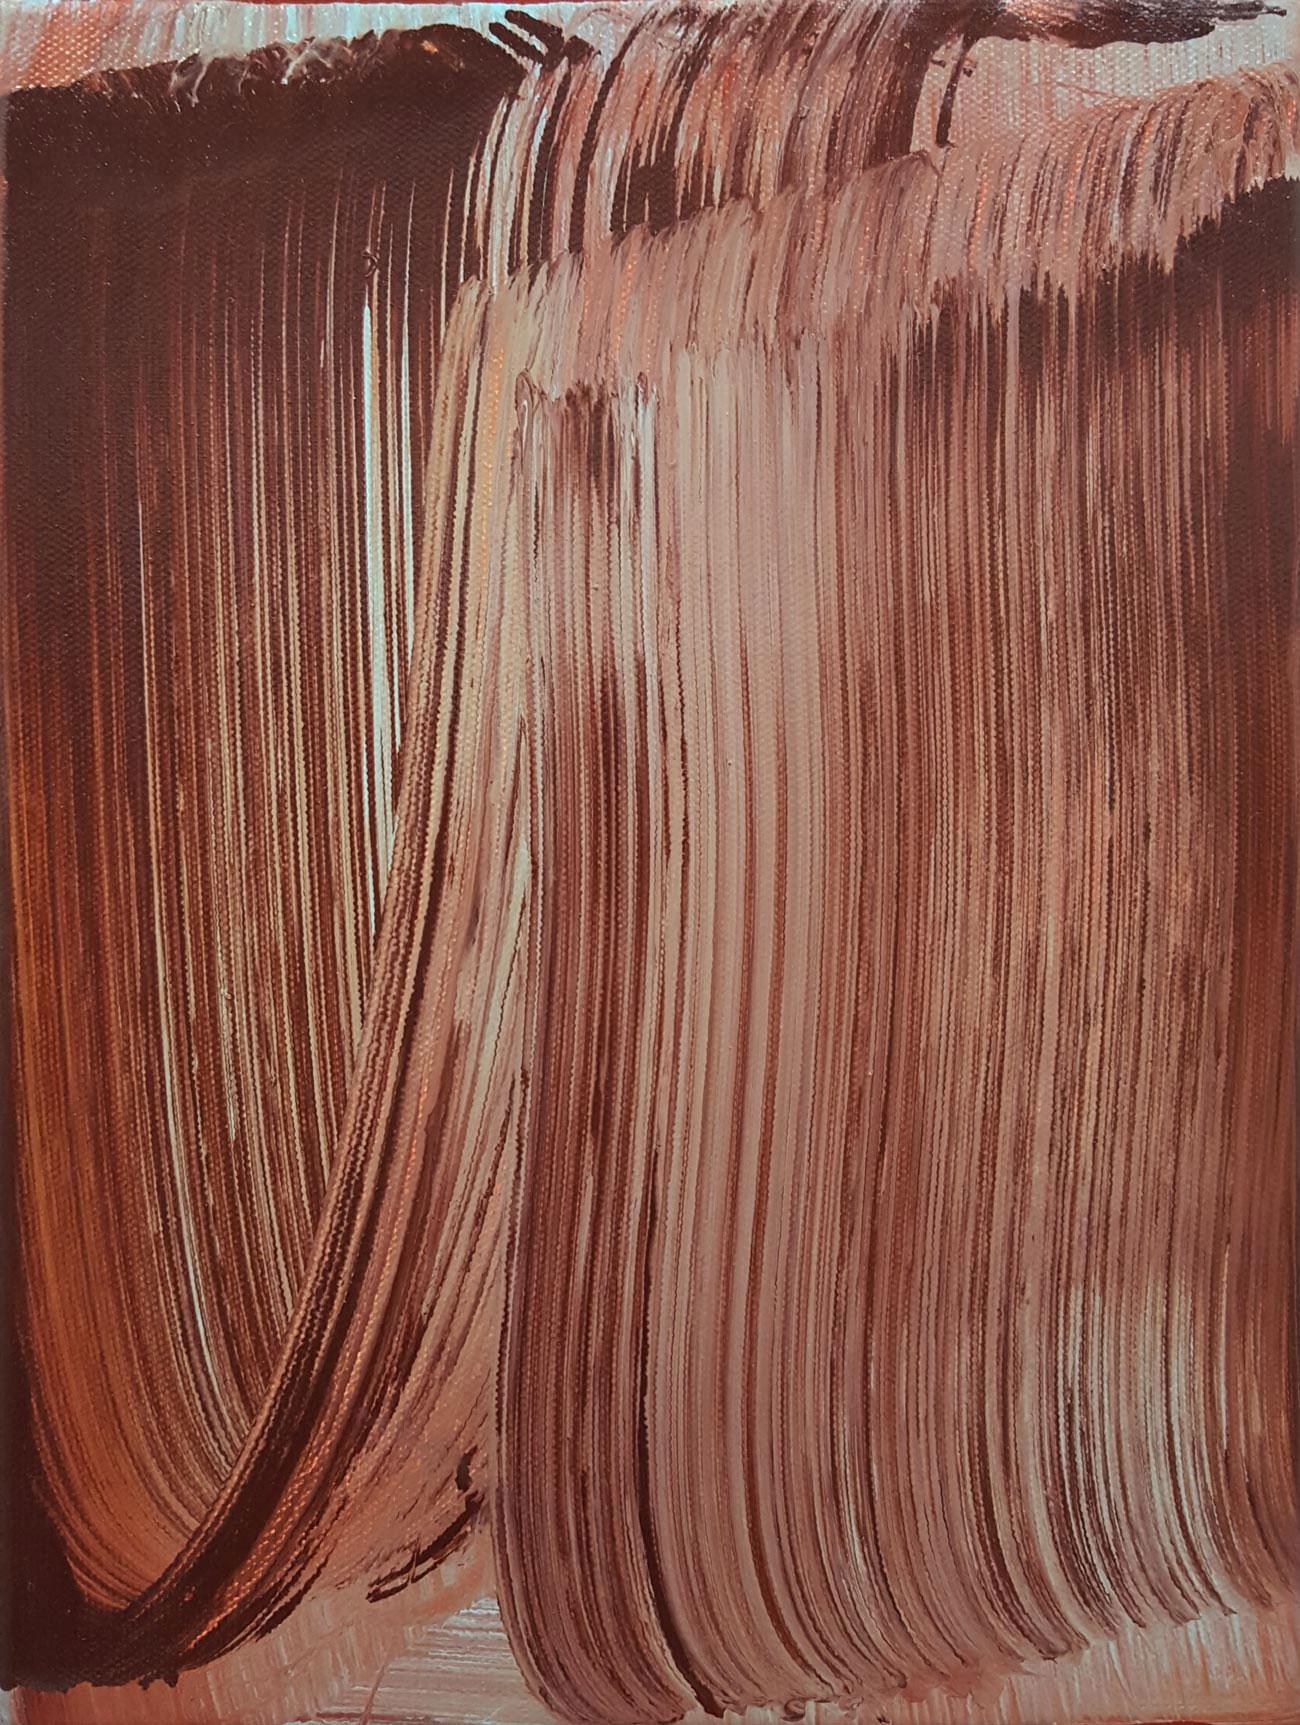 Rainy Swipe , 2015 oil on canvas 12 x 9 in.